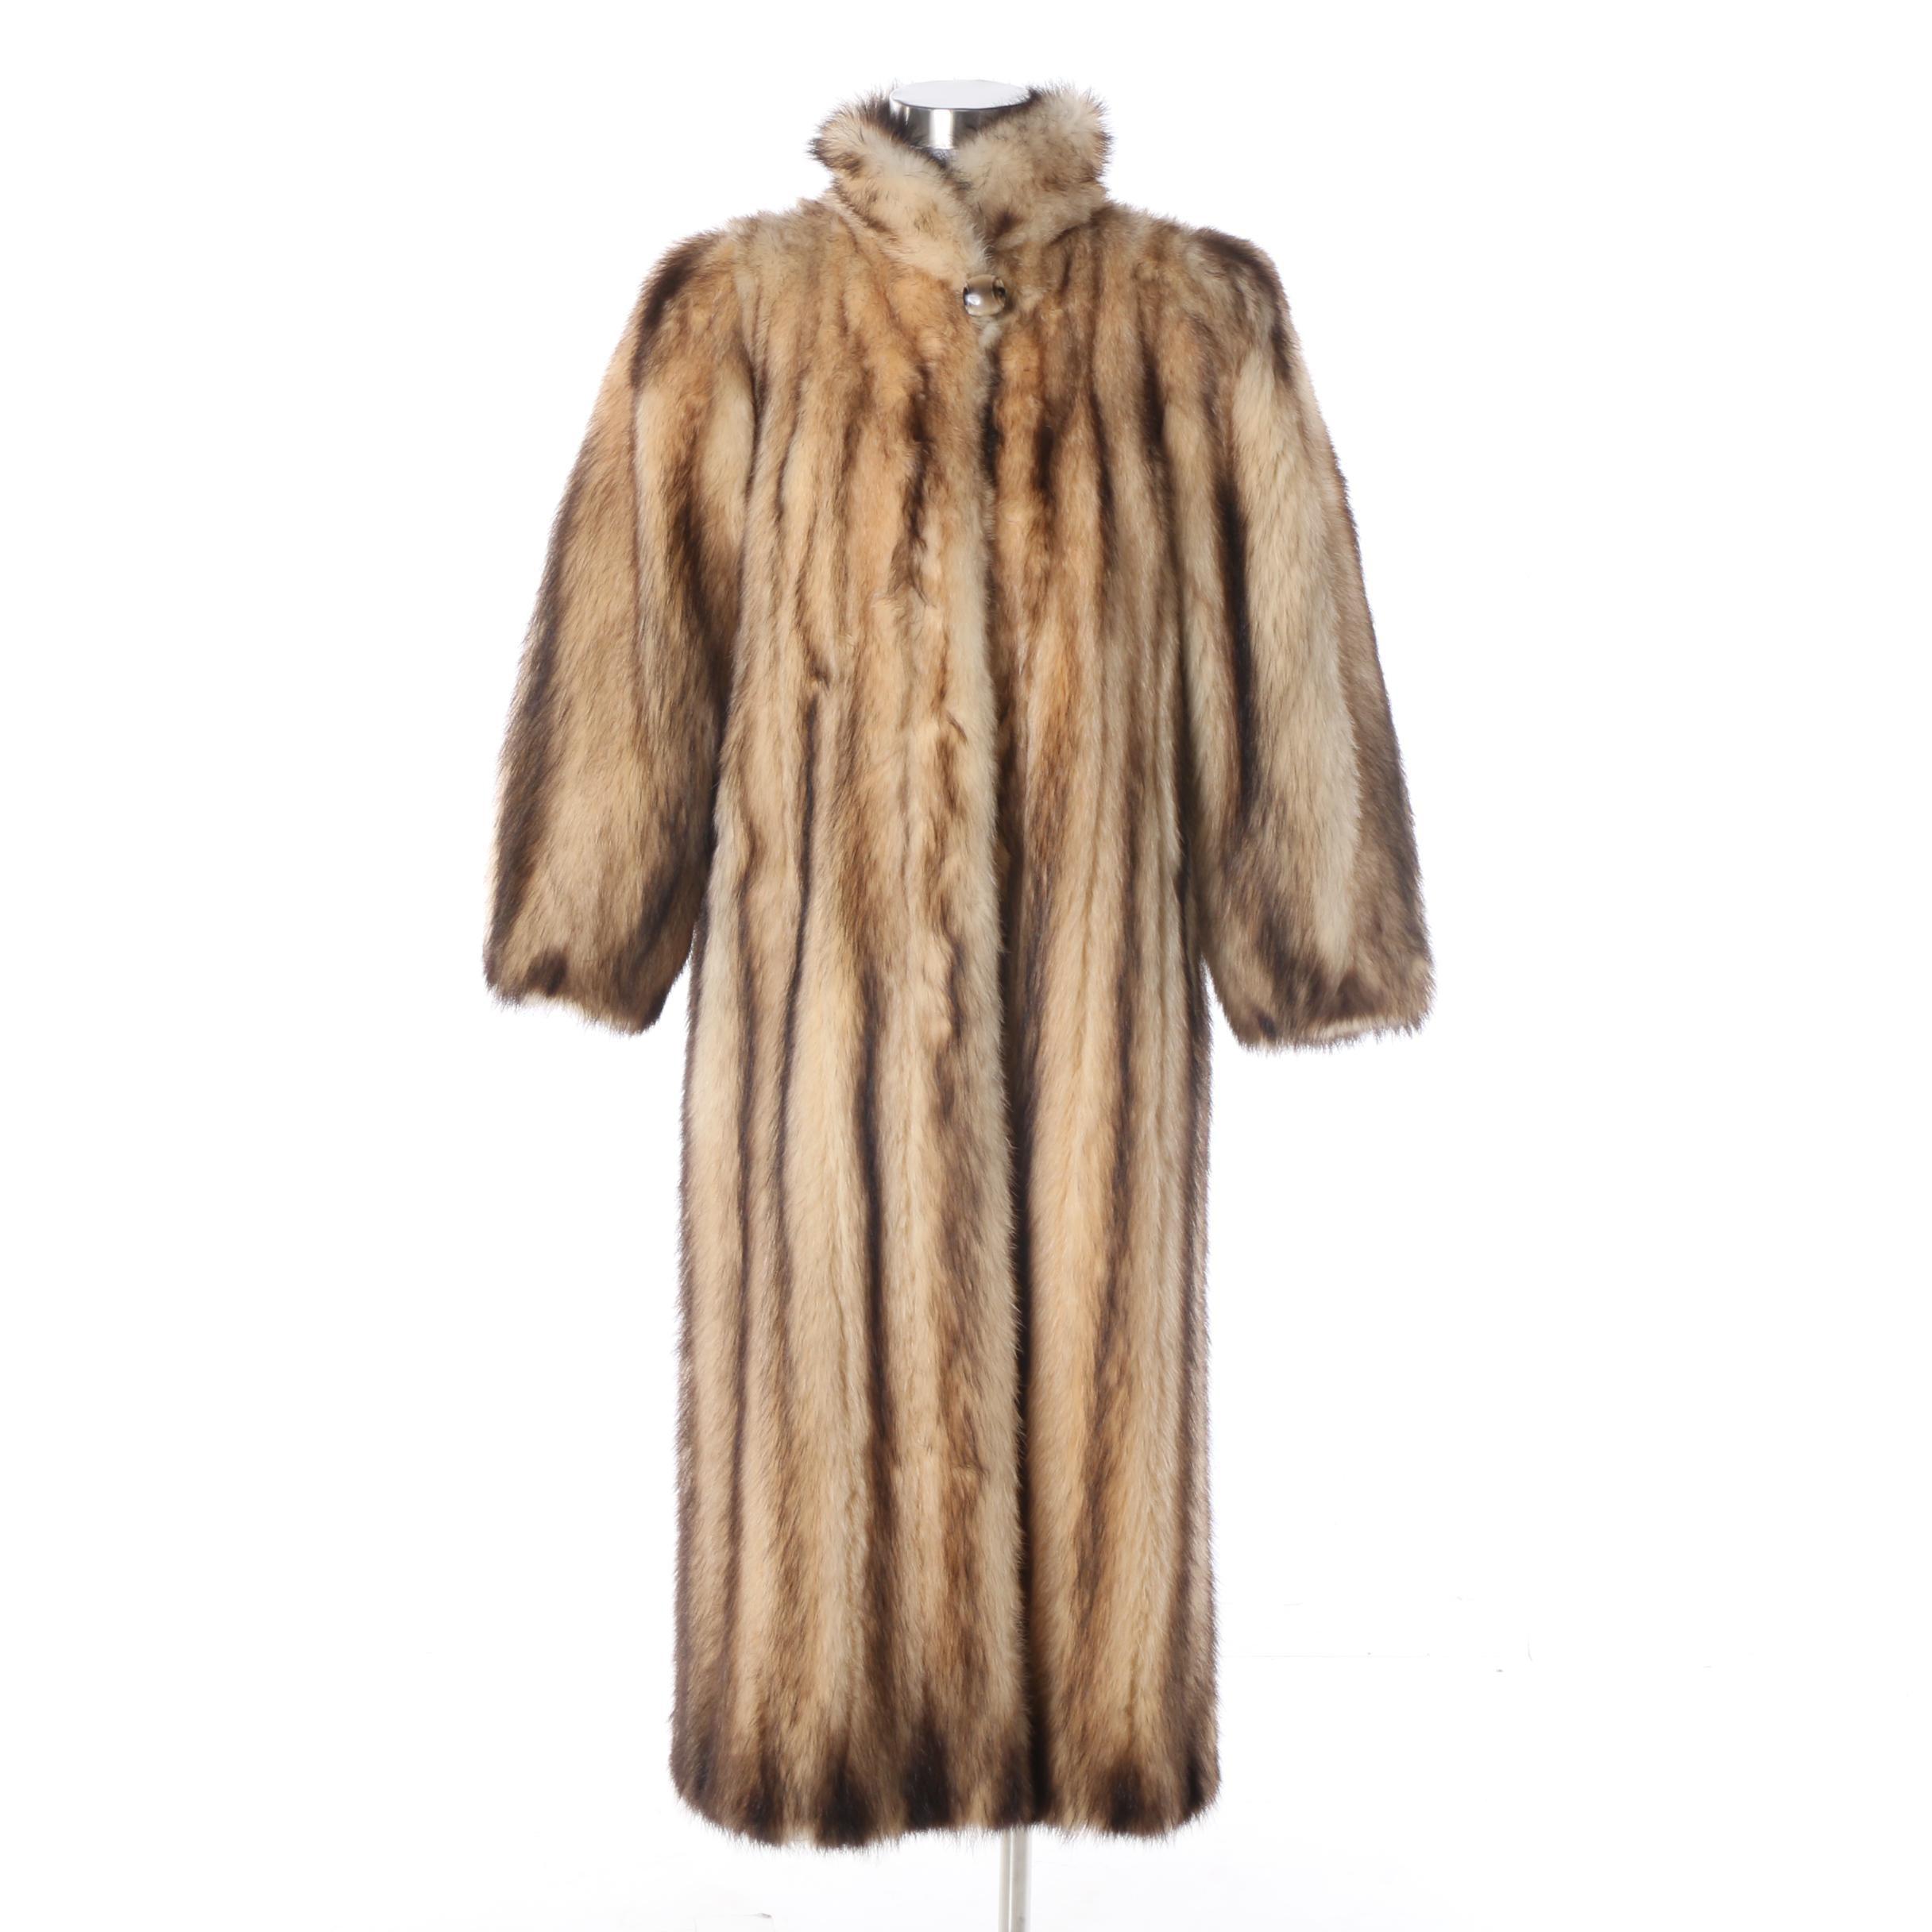 Women's Vintage Tibor Furs Fitch Fur Full-Length Coat